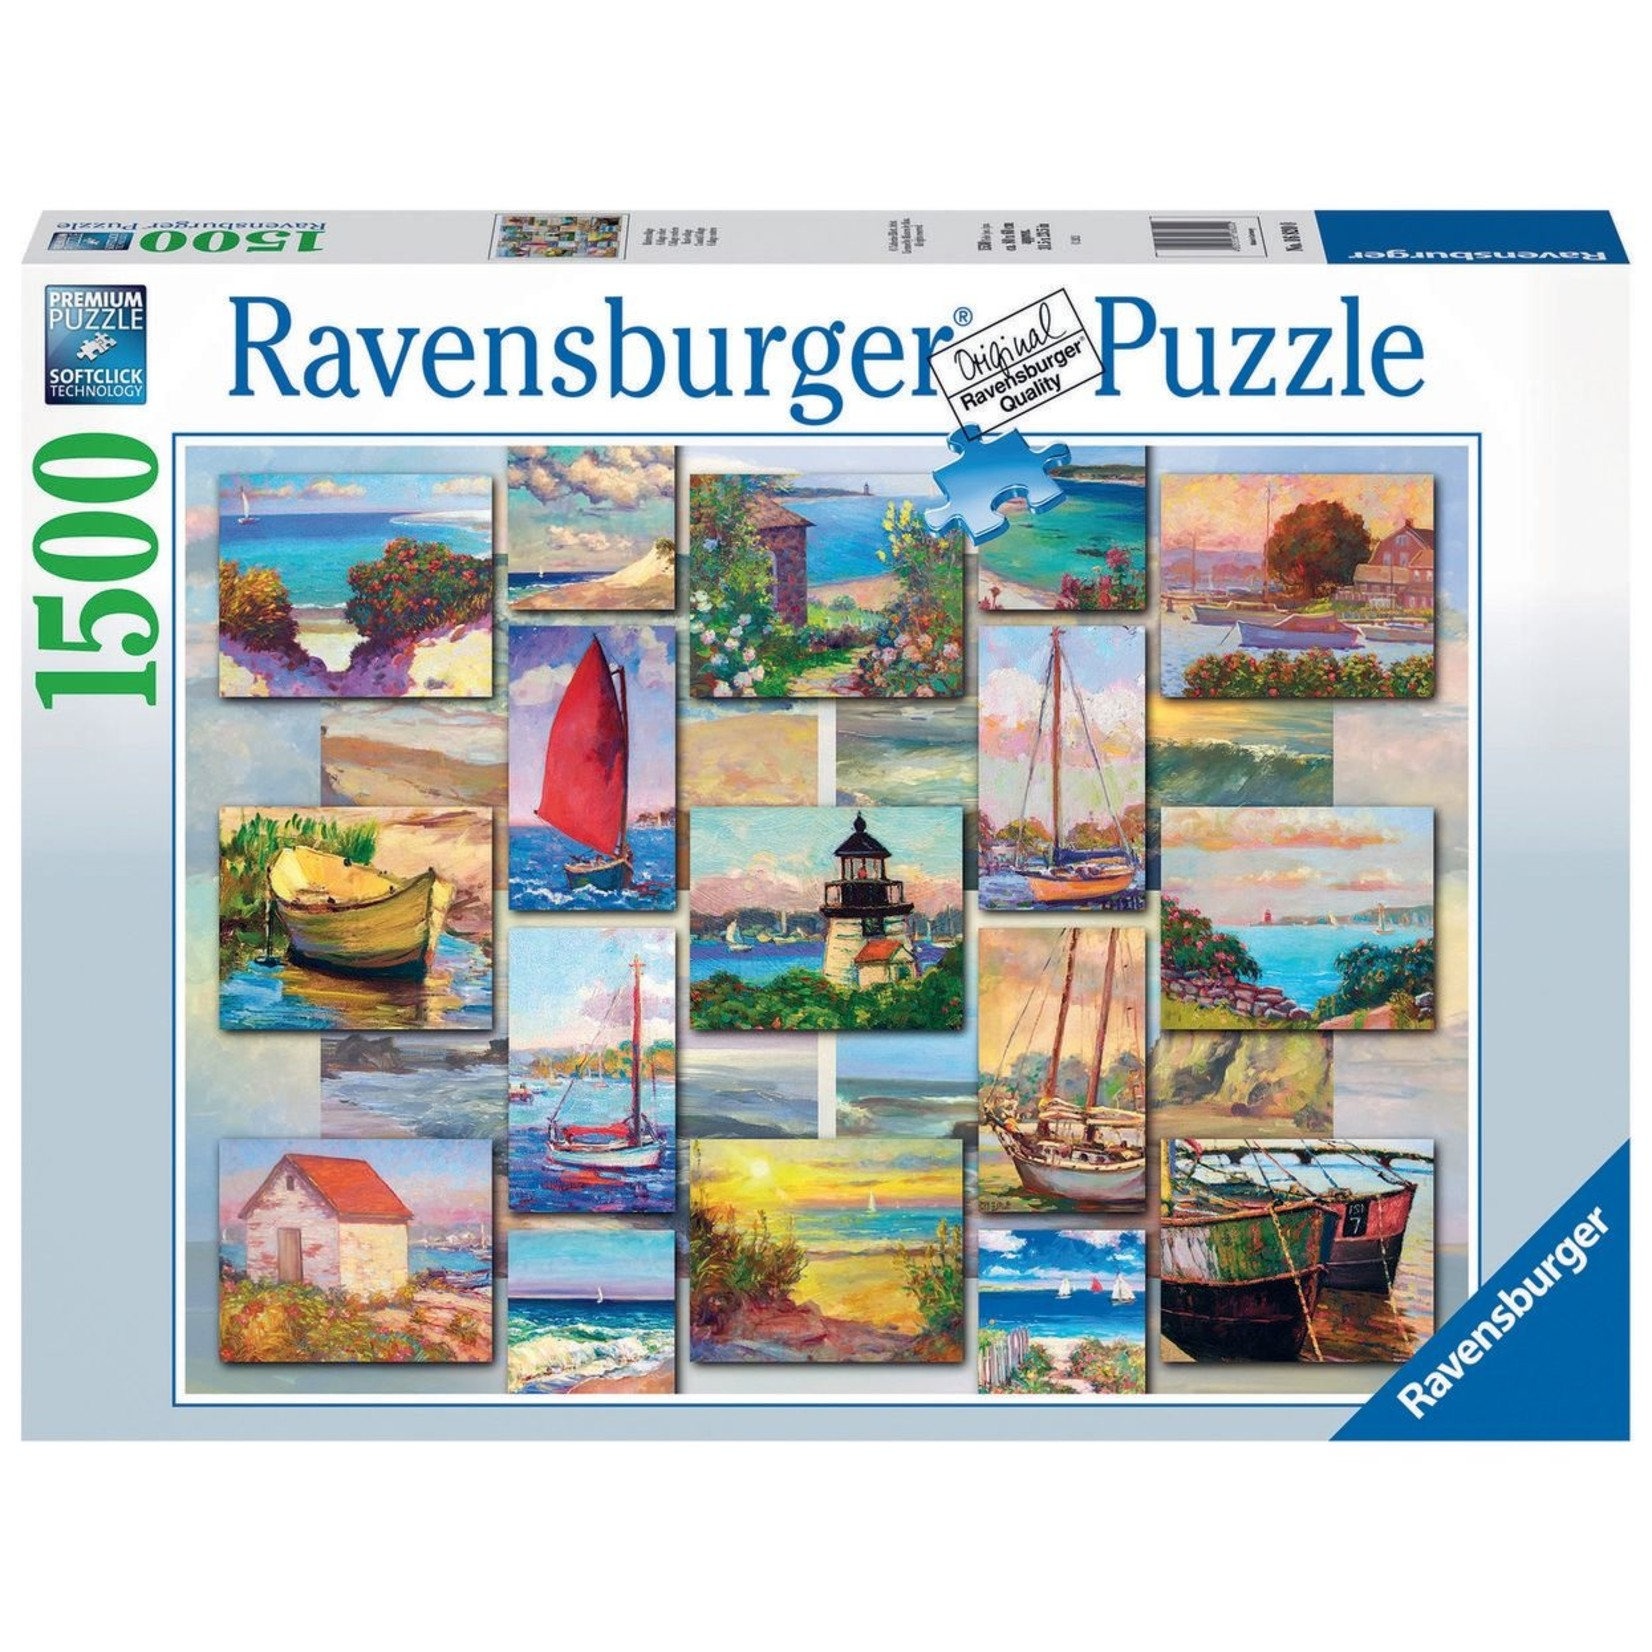 Ravensburger Coastal Collage 1500pc